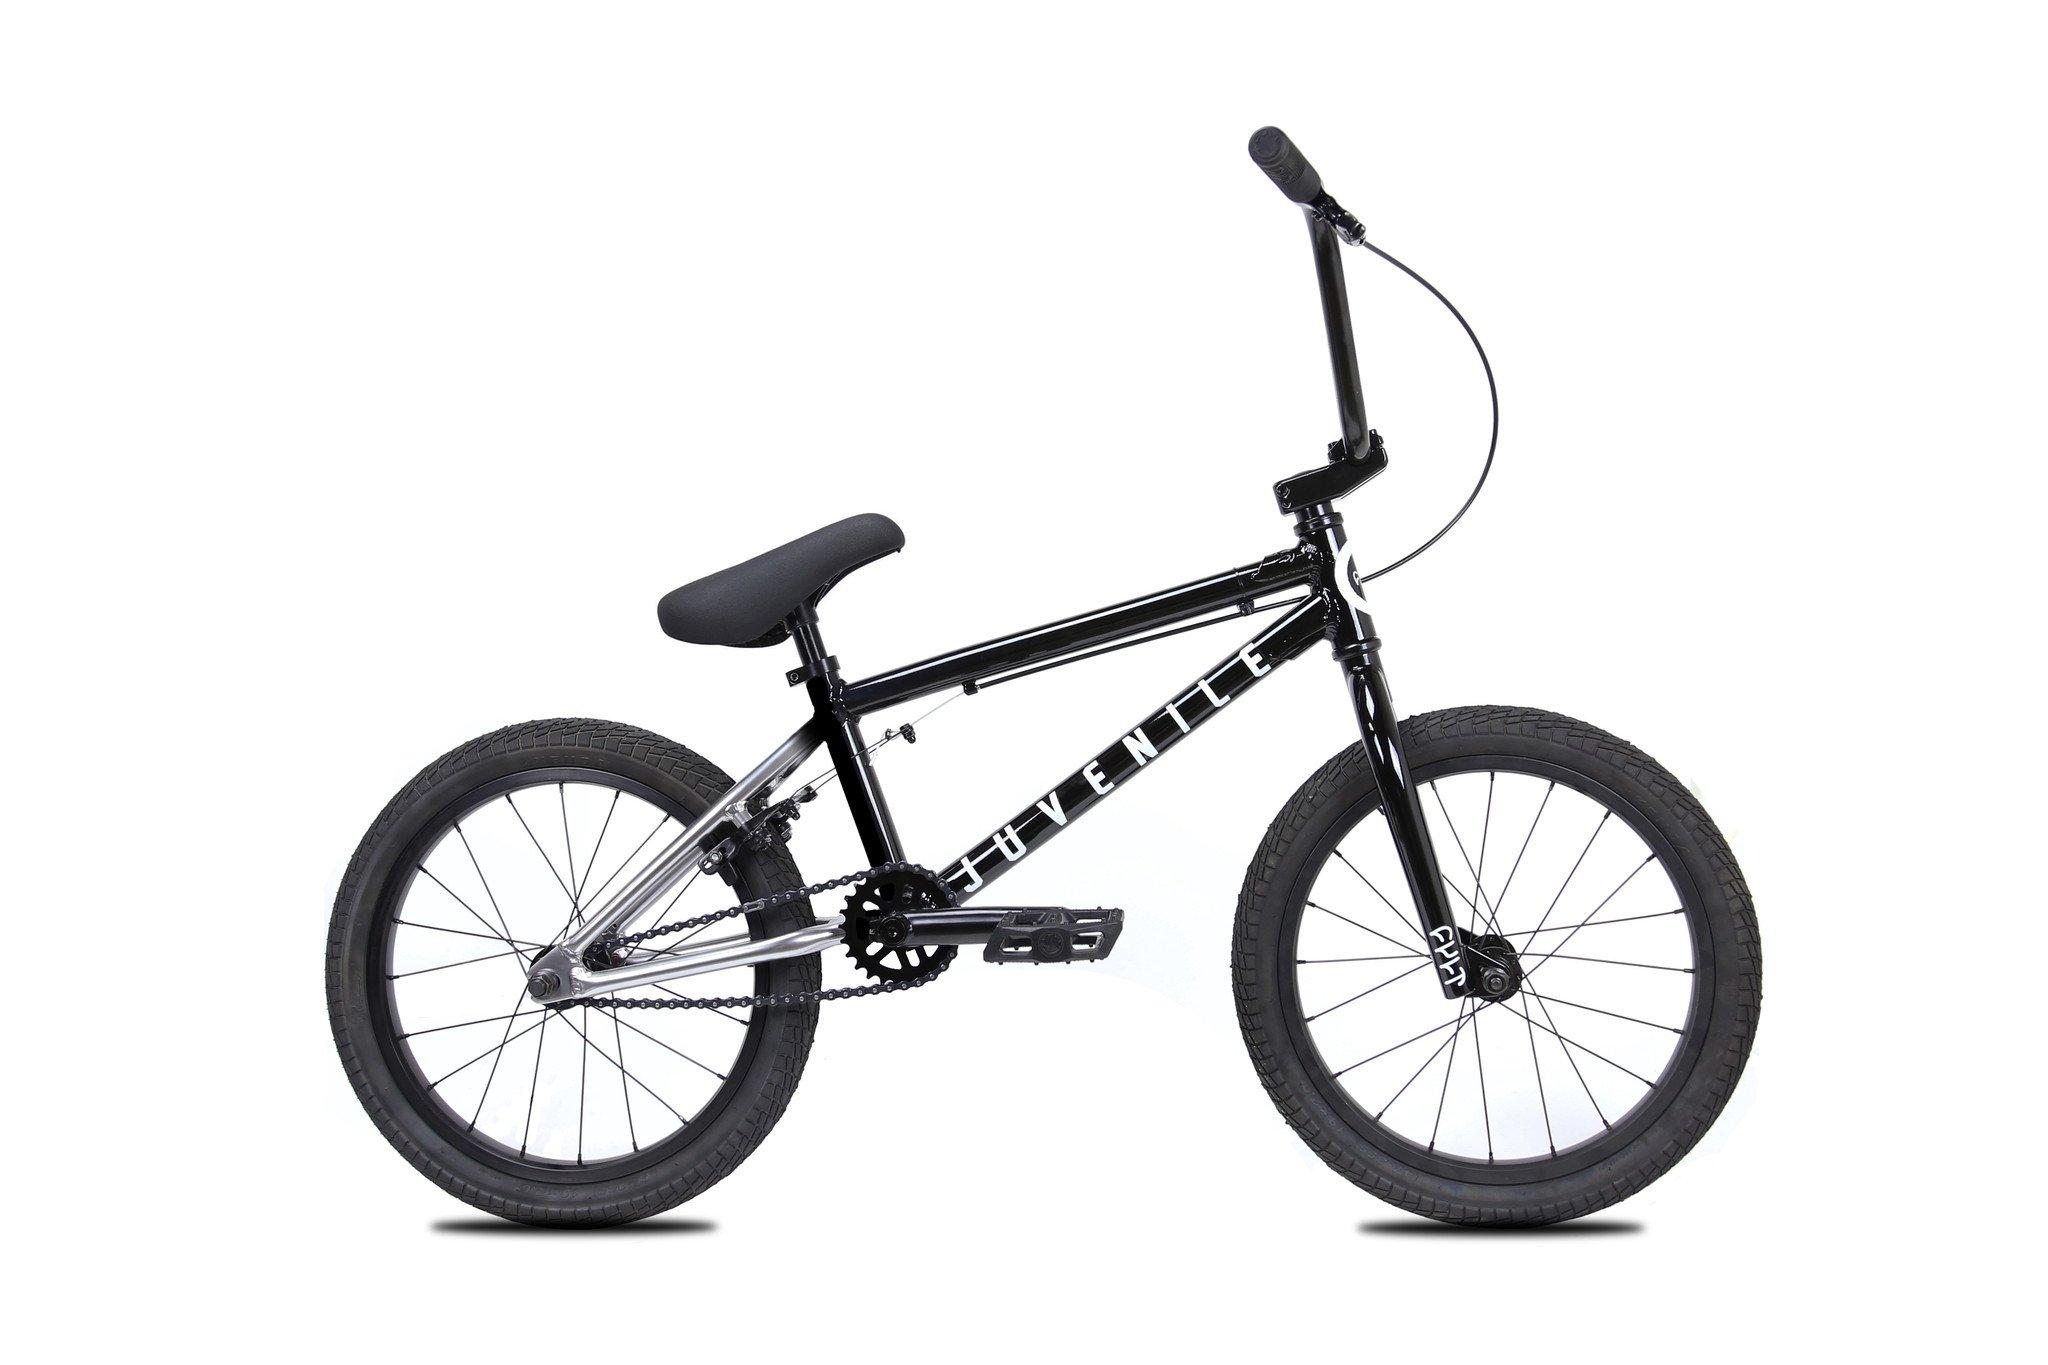 Cult Juvenile 18 Complete Bmx Bike Black Silver